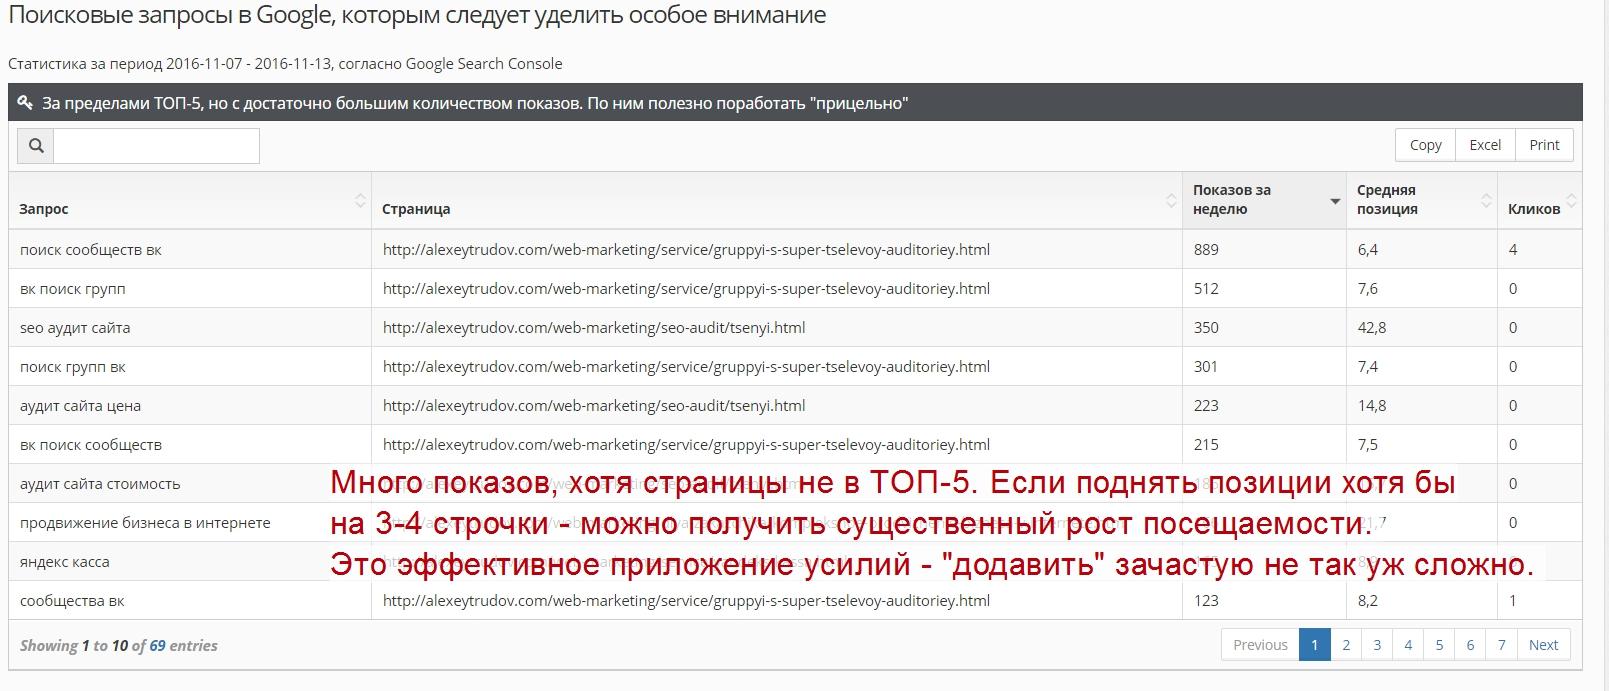 analiz-alexeytrudov-com-ot-2016-10-07-103554-seo-proryiv-google-chrome